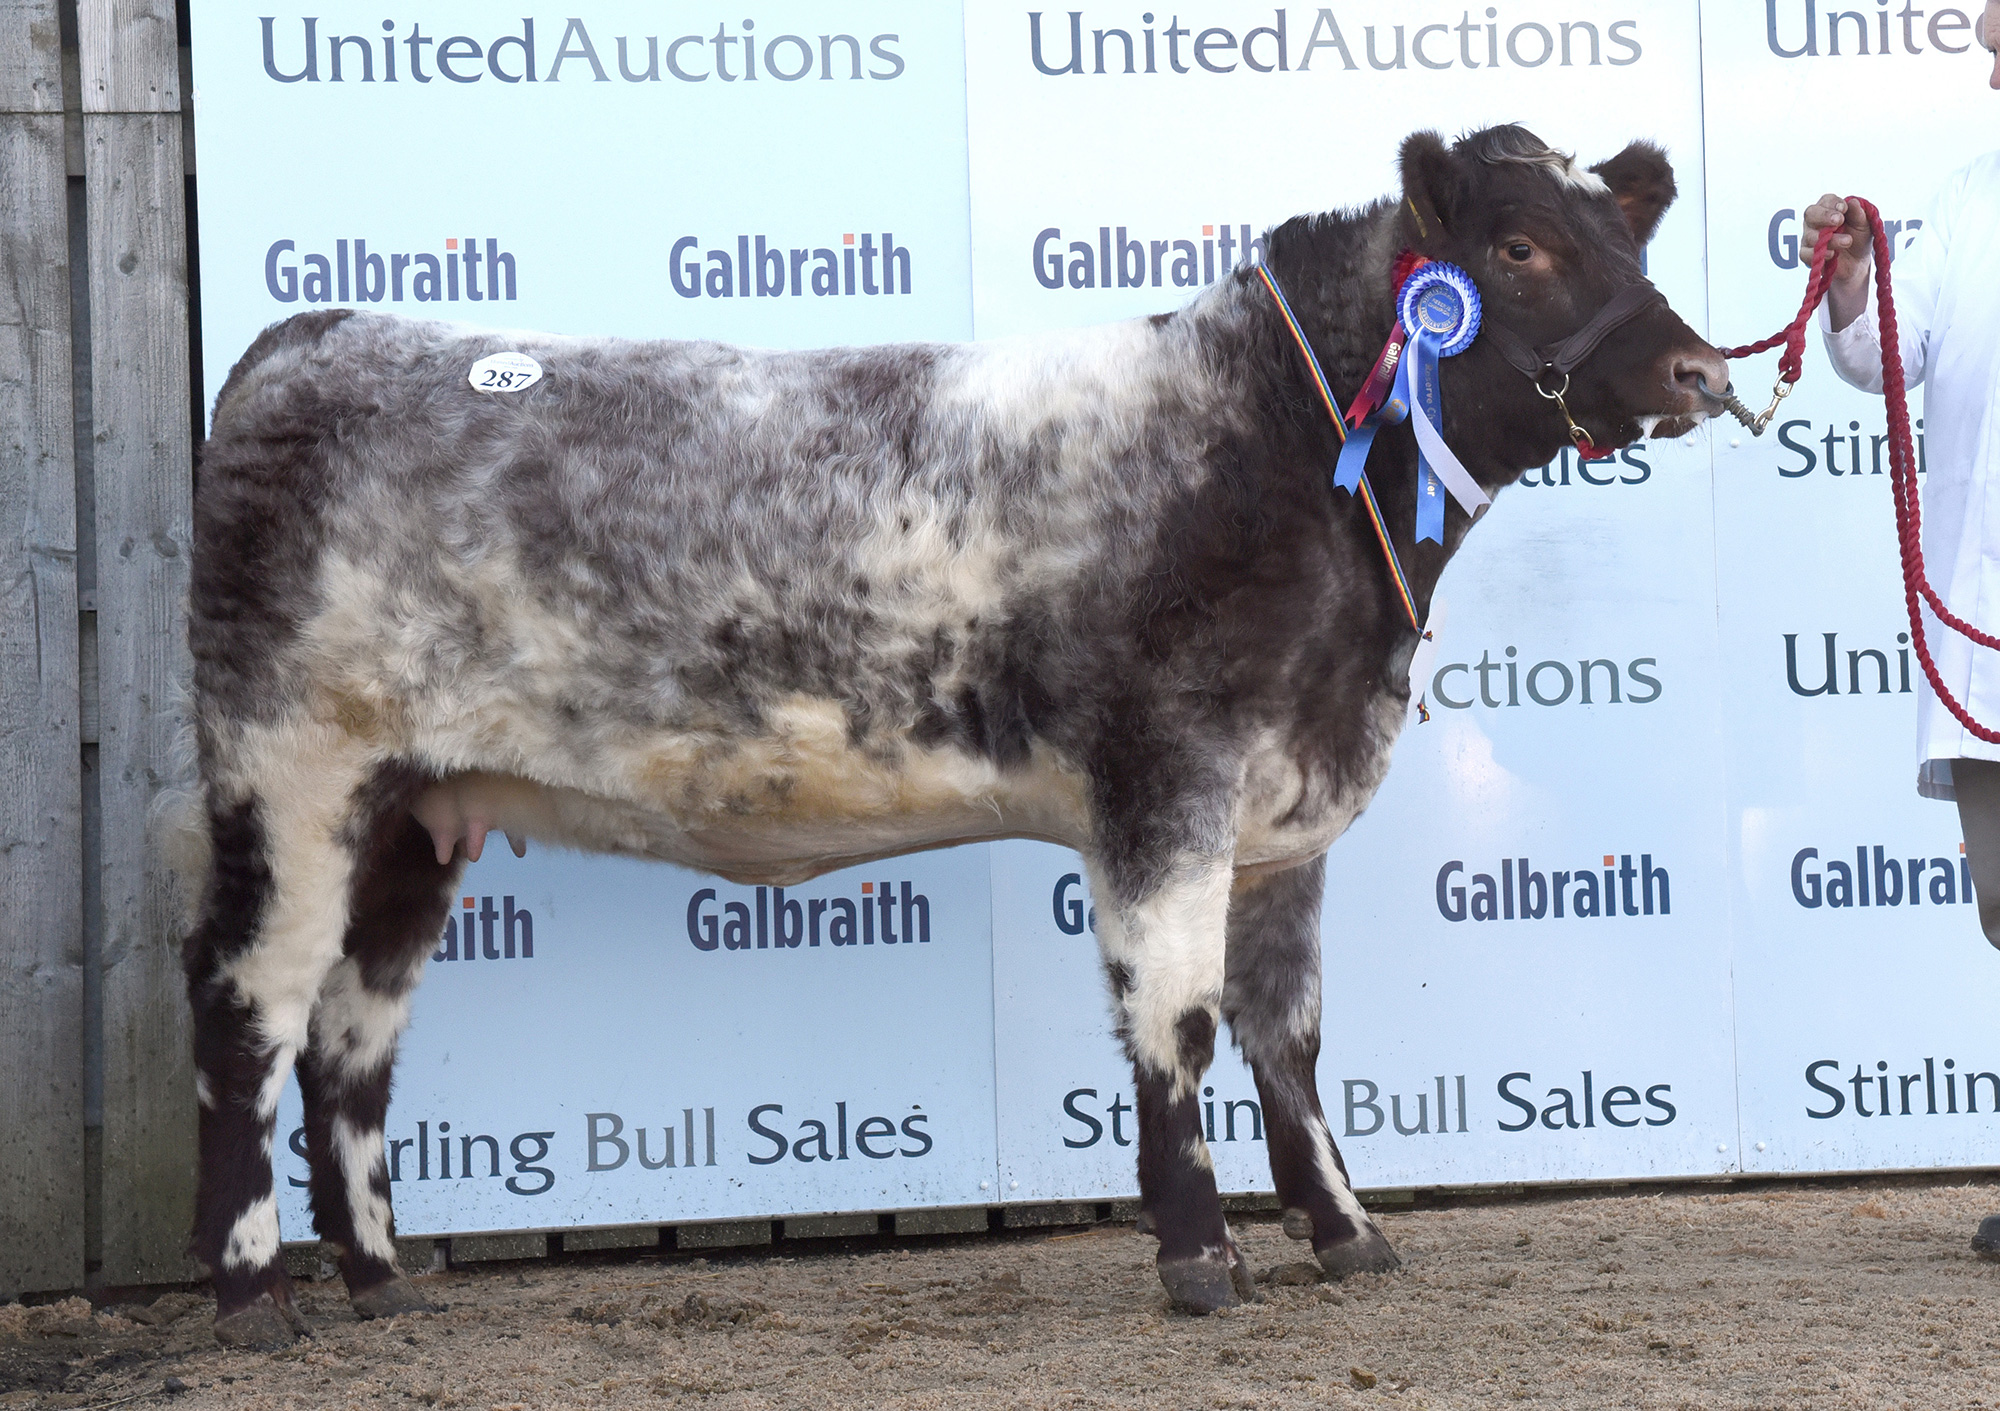 Stirling Bull Sales - February